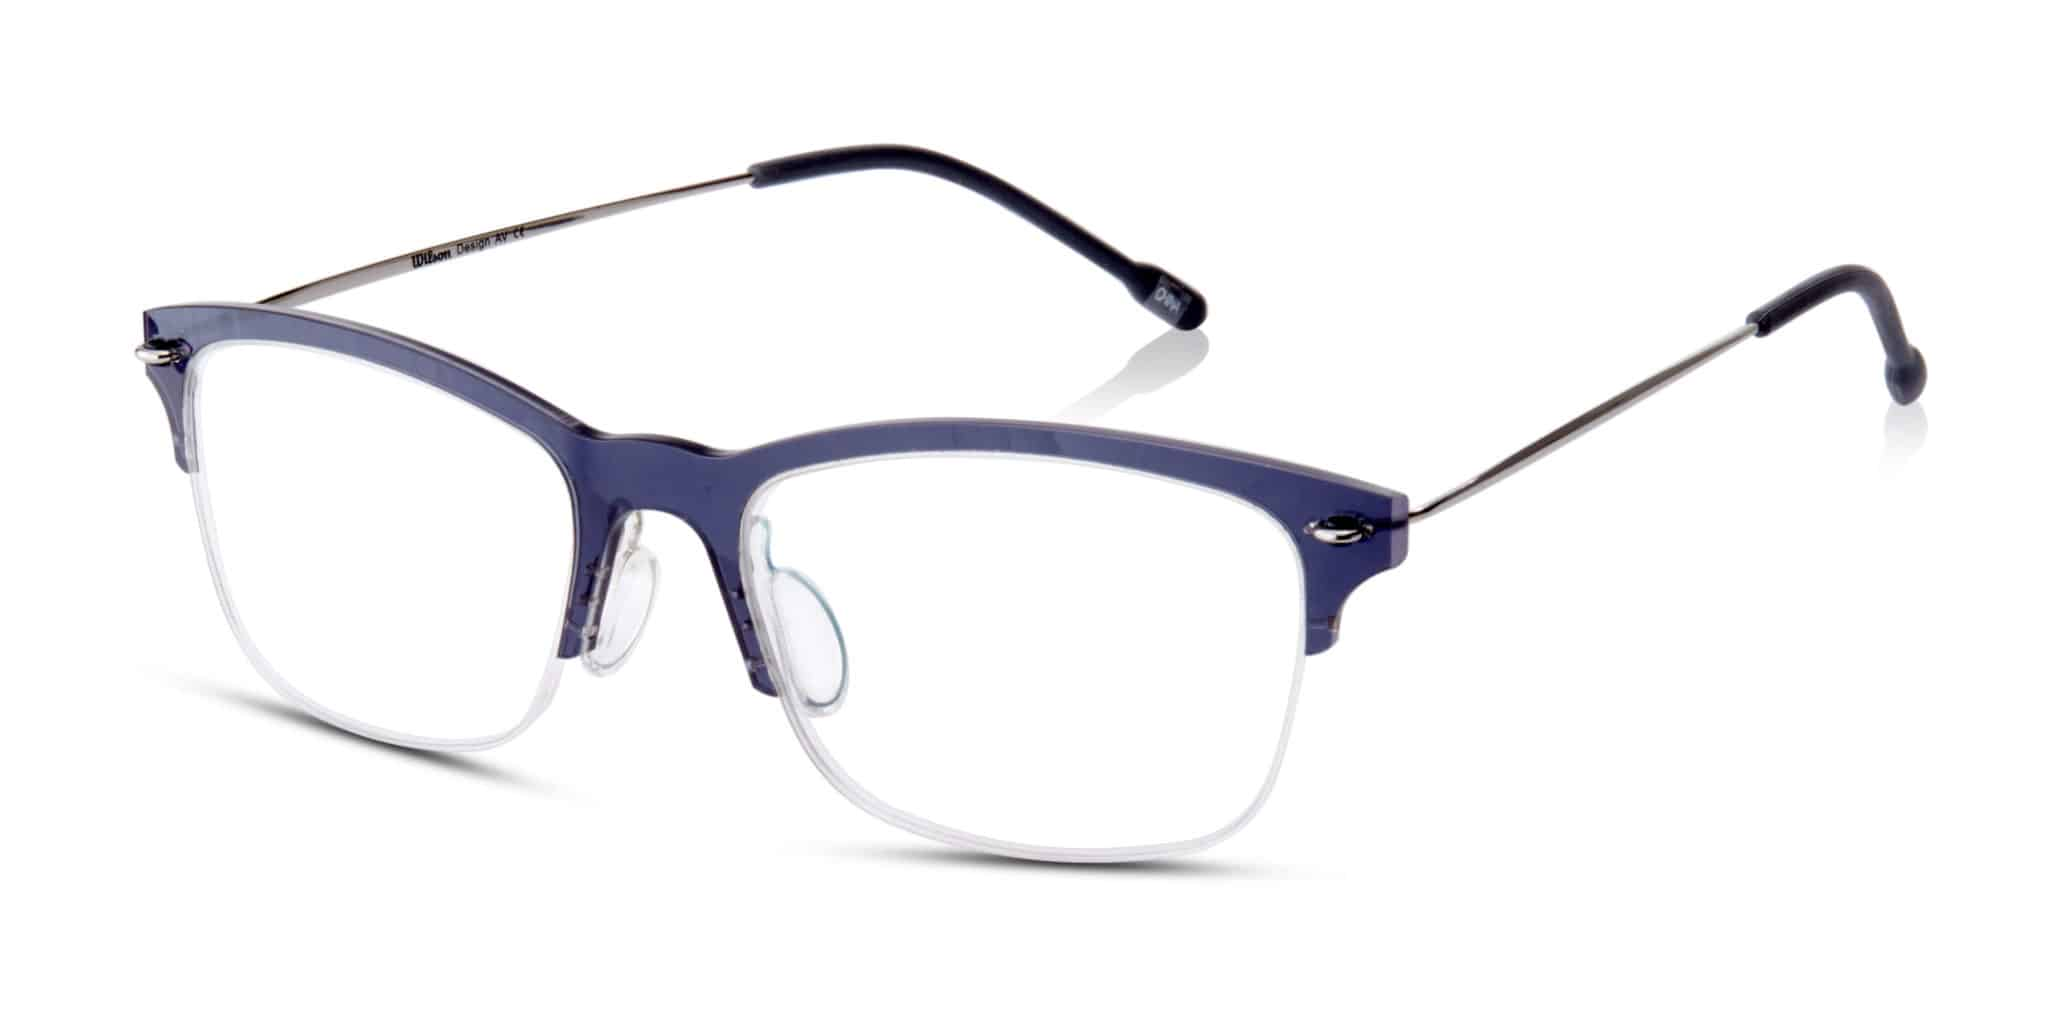 WILSON- חצי מסגרת פלסטיק כחול/סגול עדין